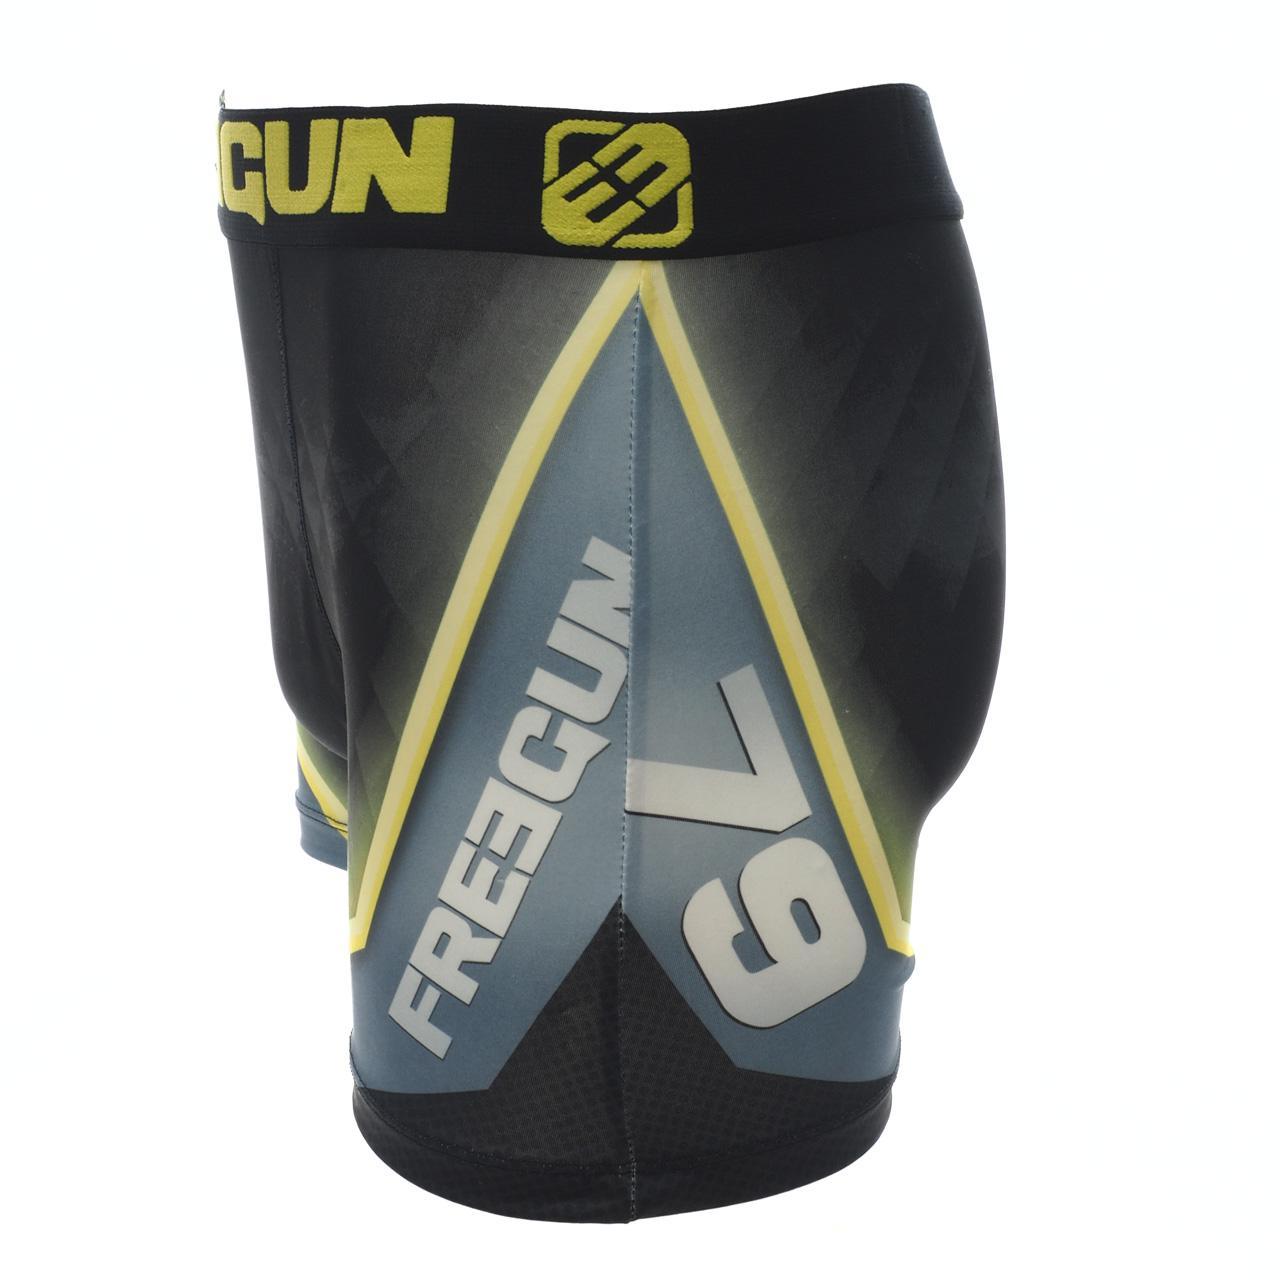 Underwear-Boxer-Freegun-Green-Black-Vrt-Black-Boxer-17919-New thumbnail 2